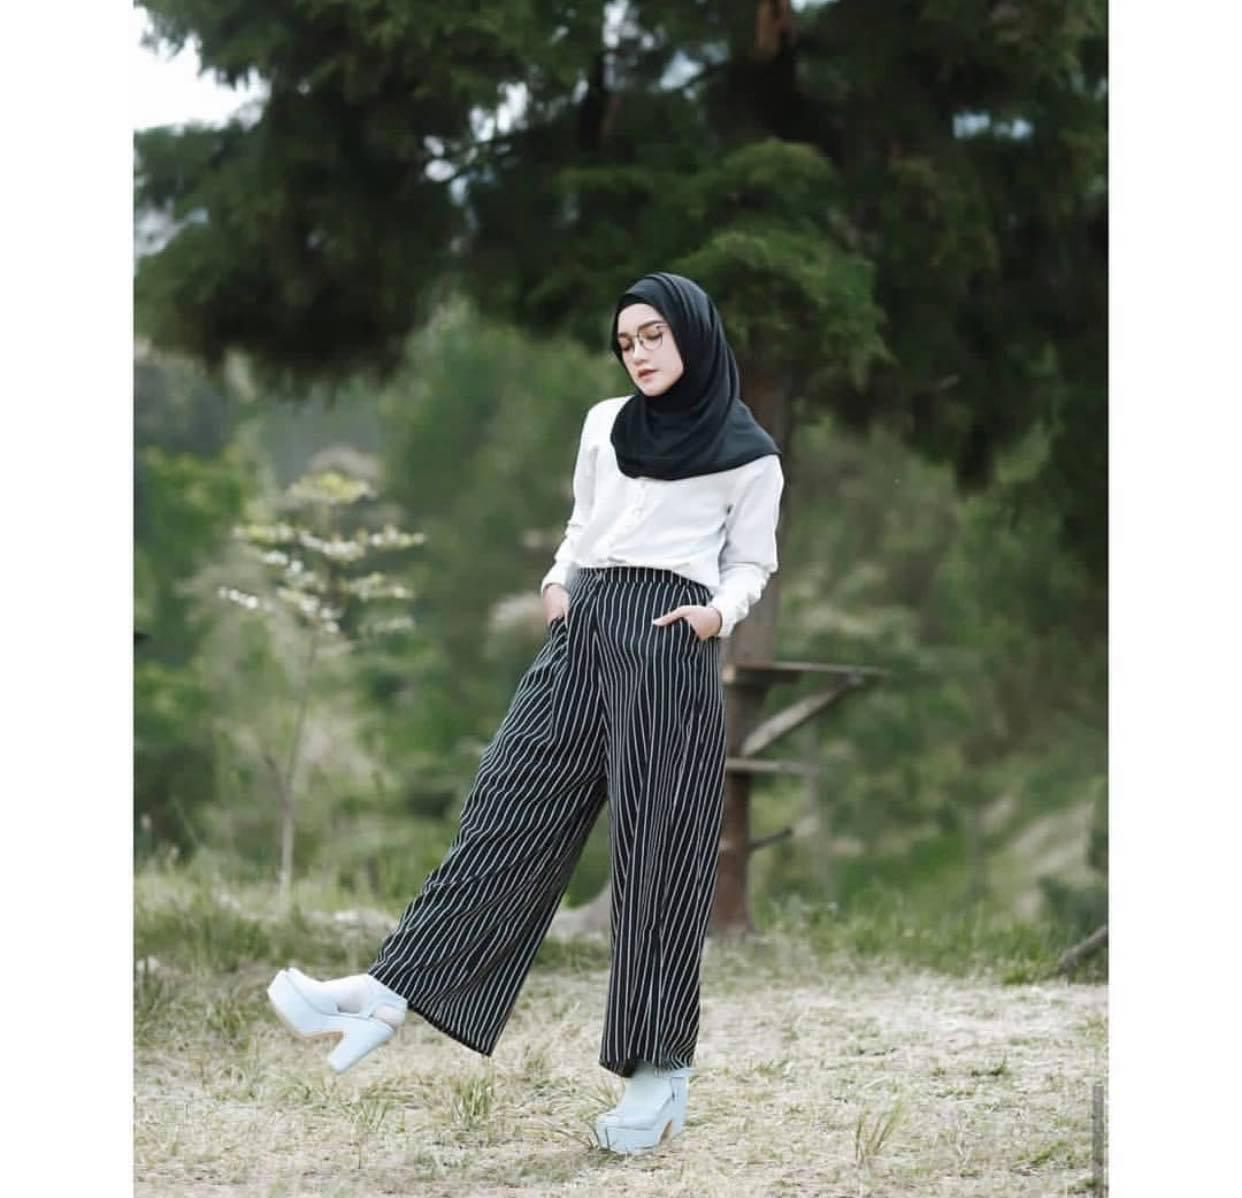 Jual Celana Panjang   Celana Pendek Wanita  22544b3df9